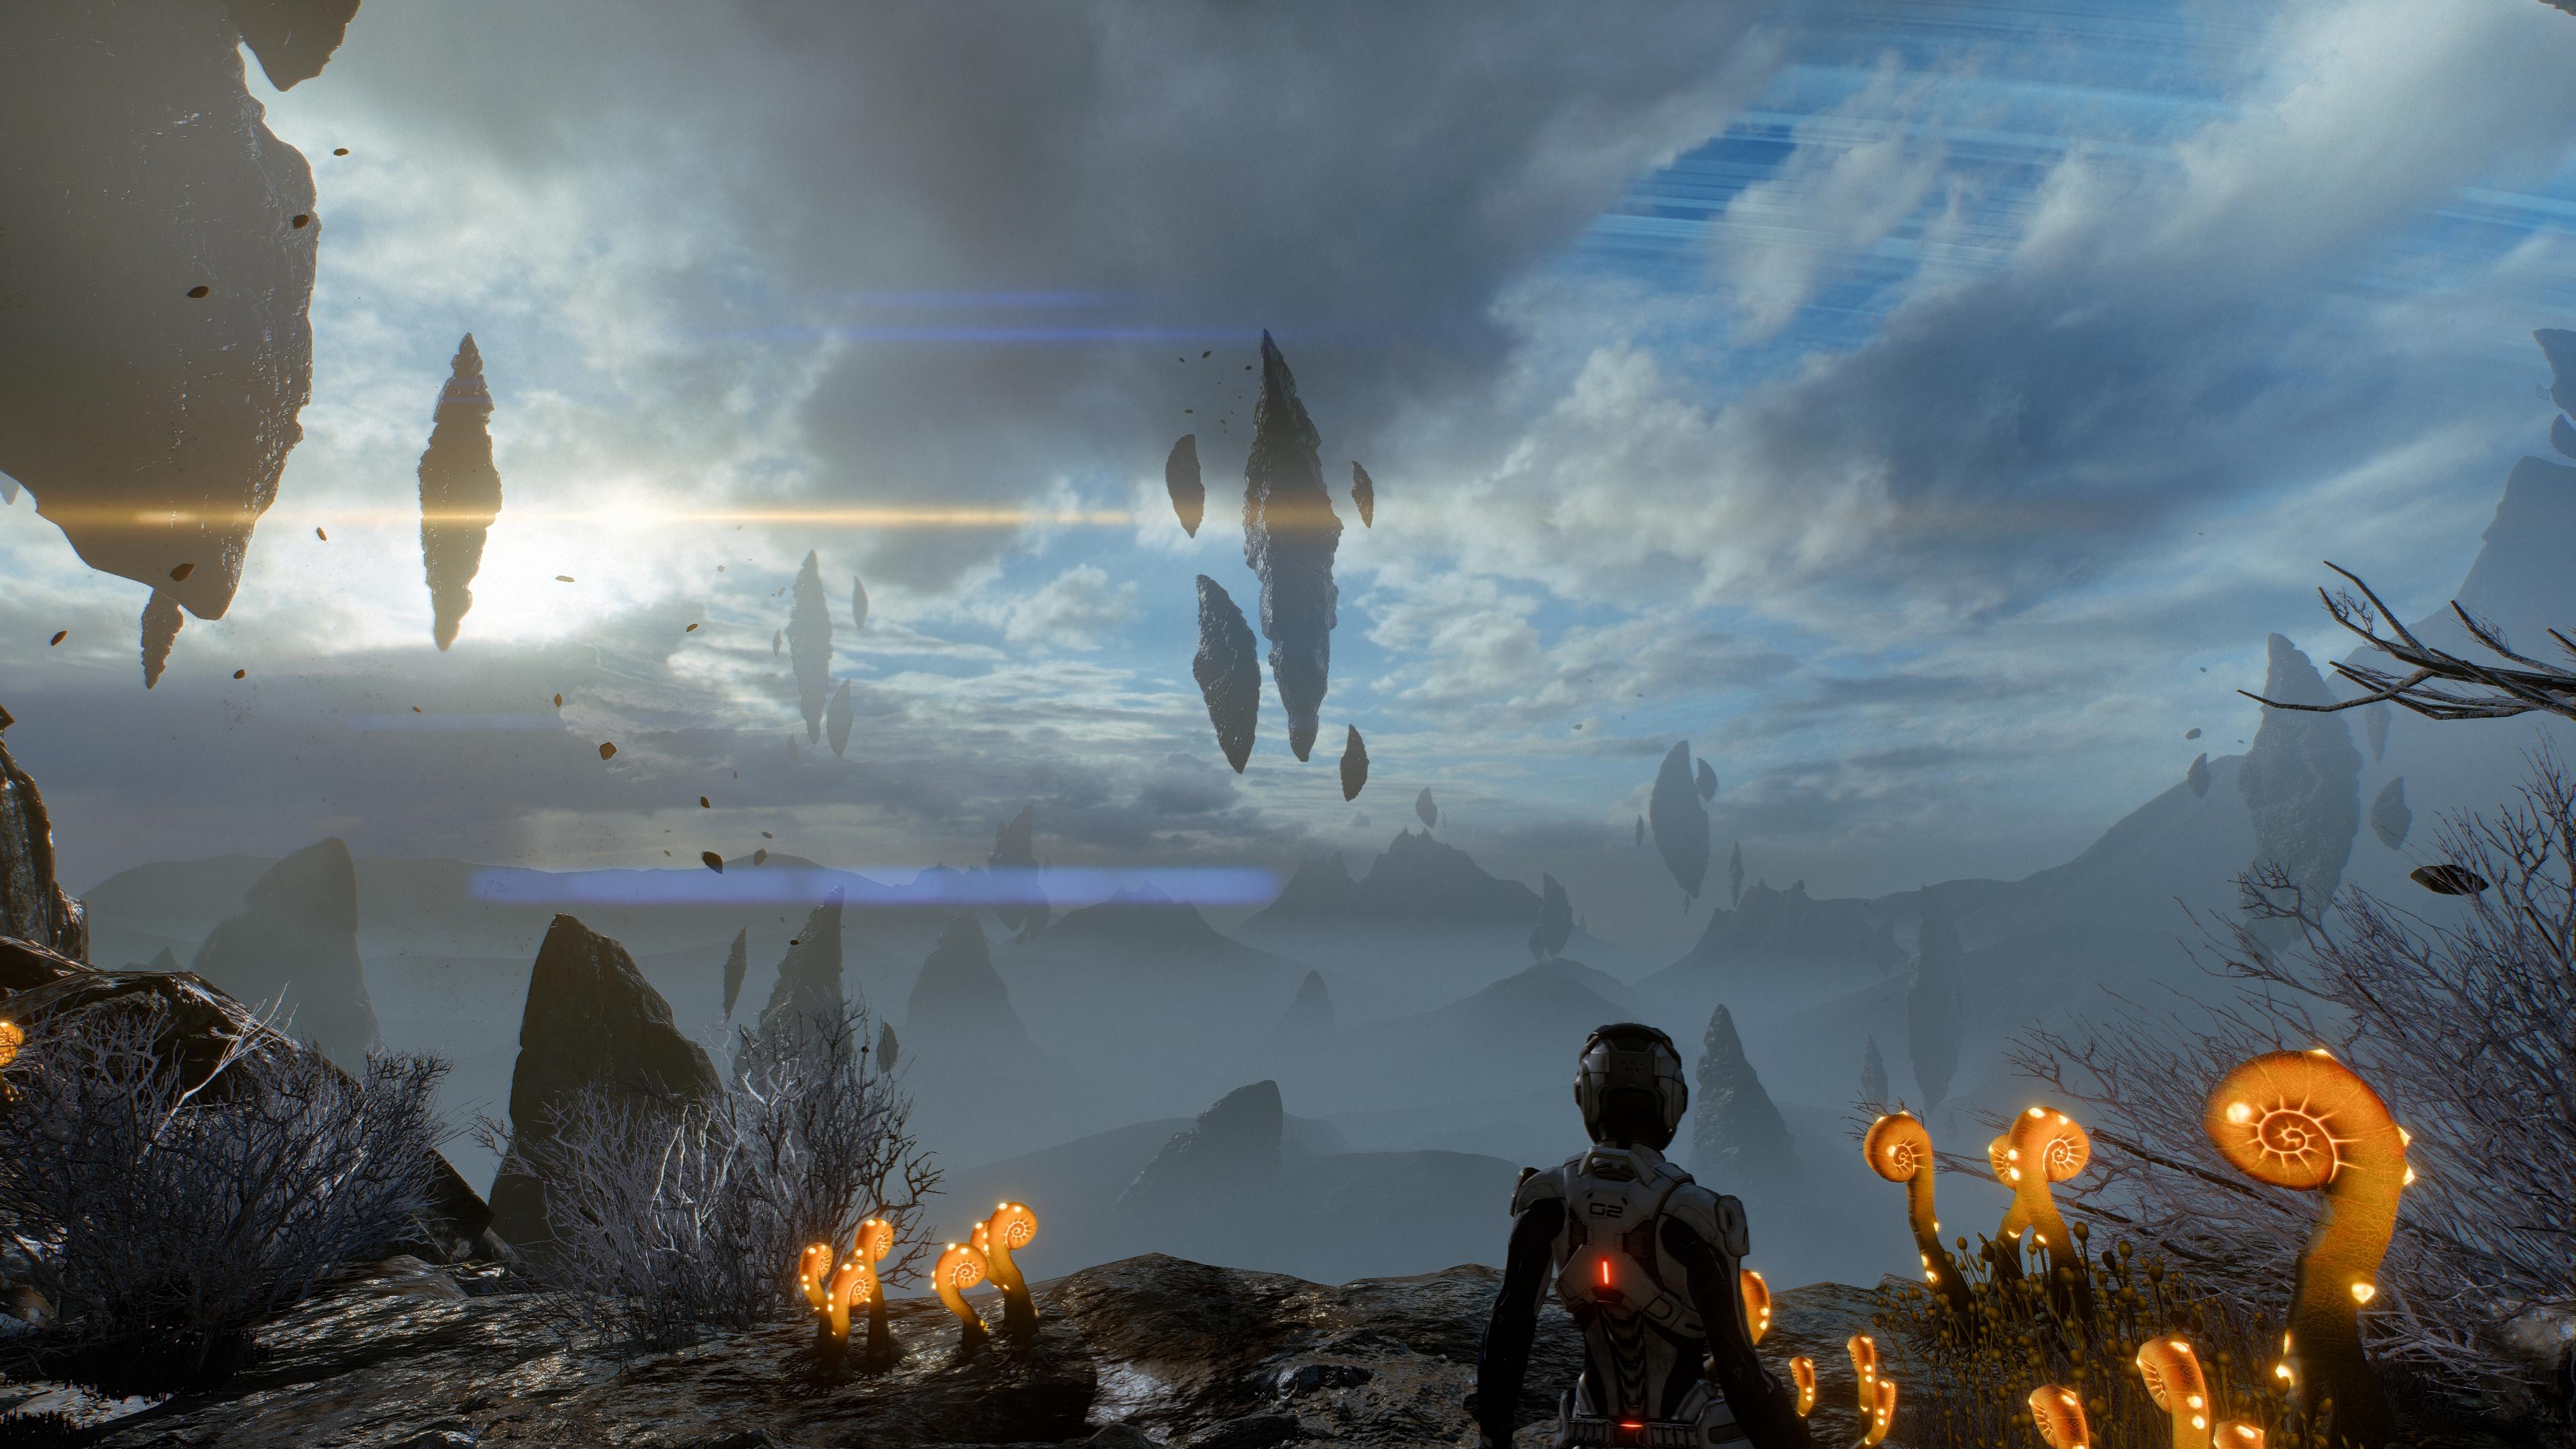 Wallpaper Mass Effect Andromeda Andromeda Initiative Mass